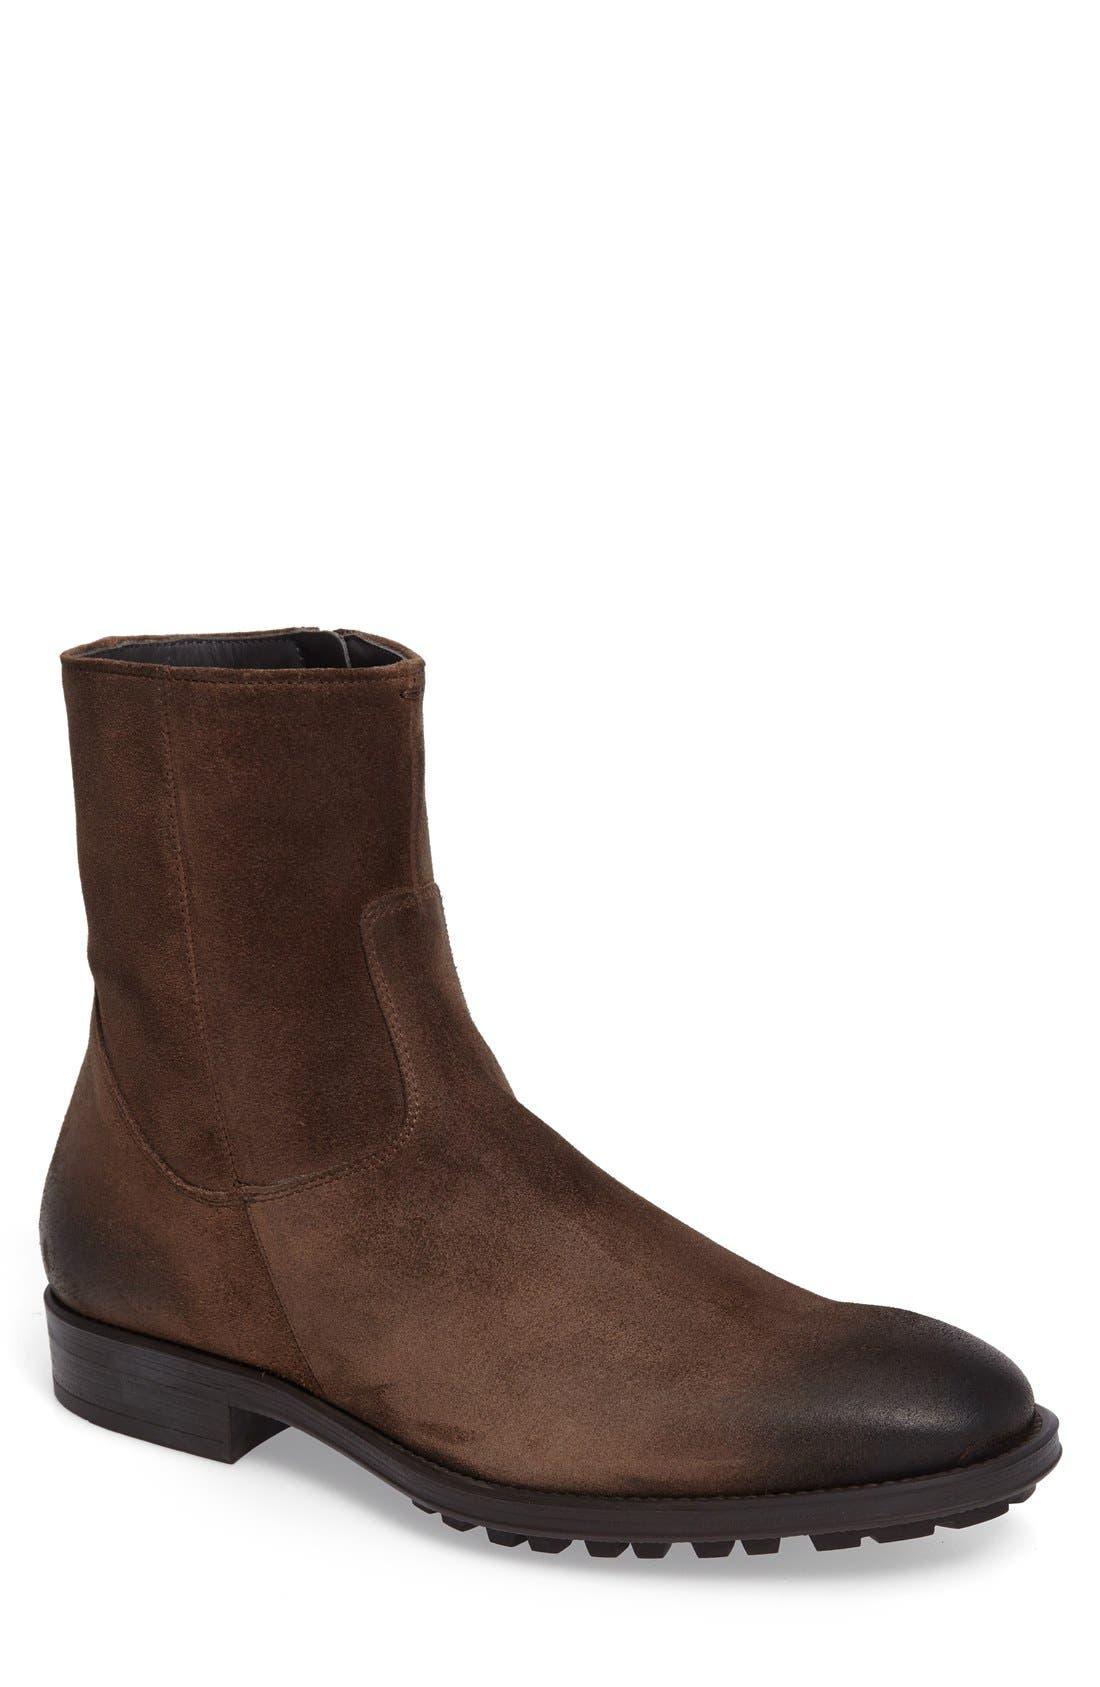 'Harrison' Zip Boot,                         Main,                         color, Brown